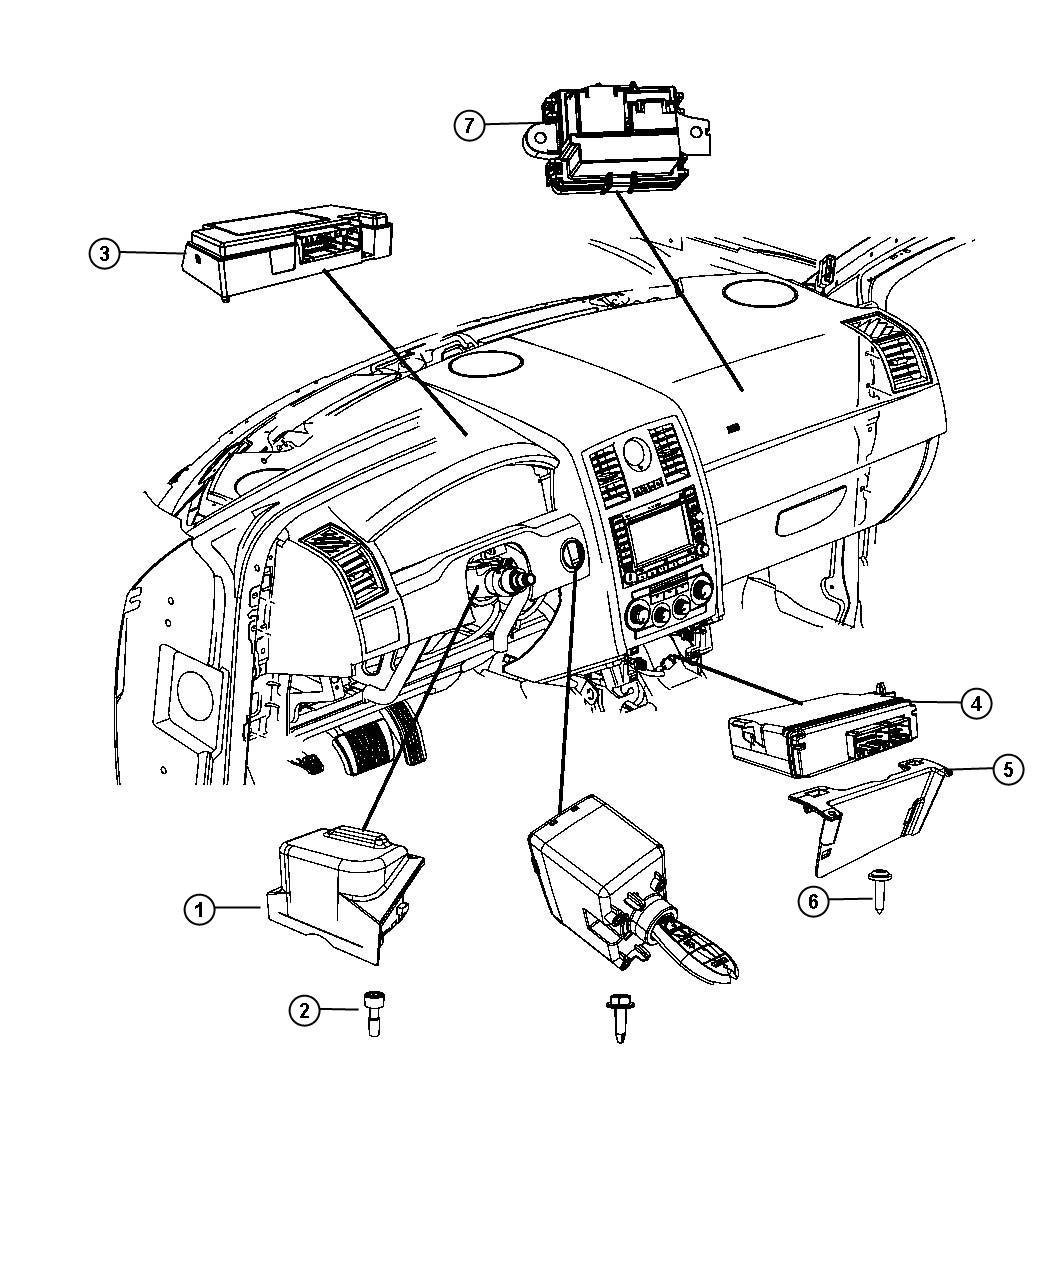 2009 Chrysler 300 Module. Interface, steering control